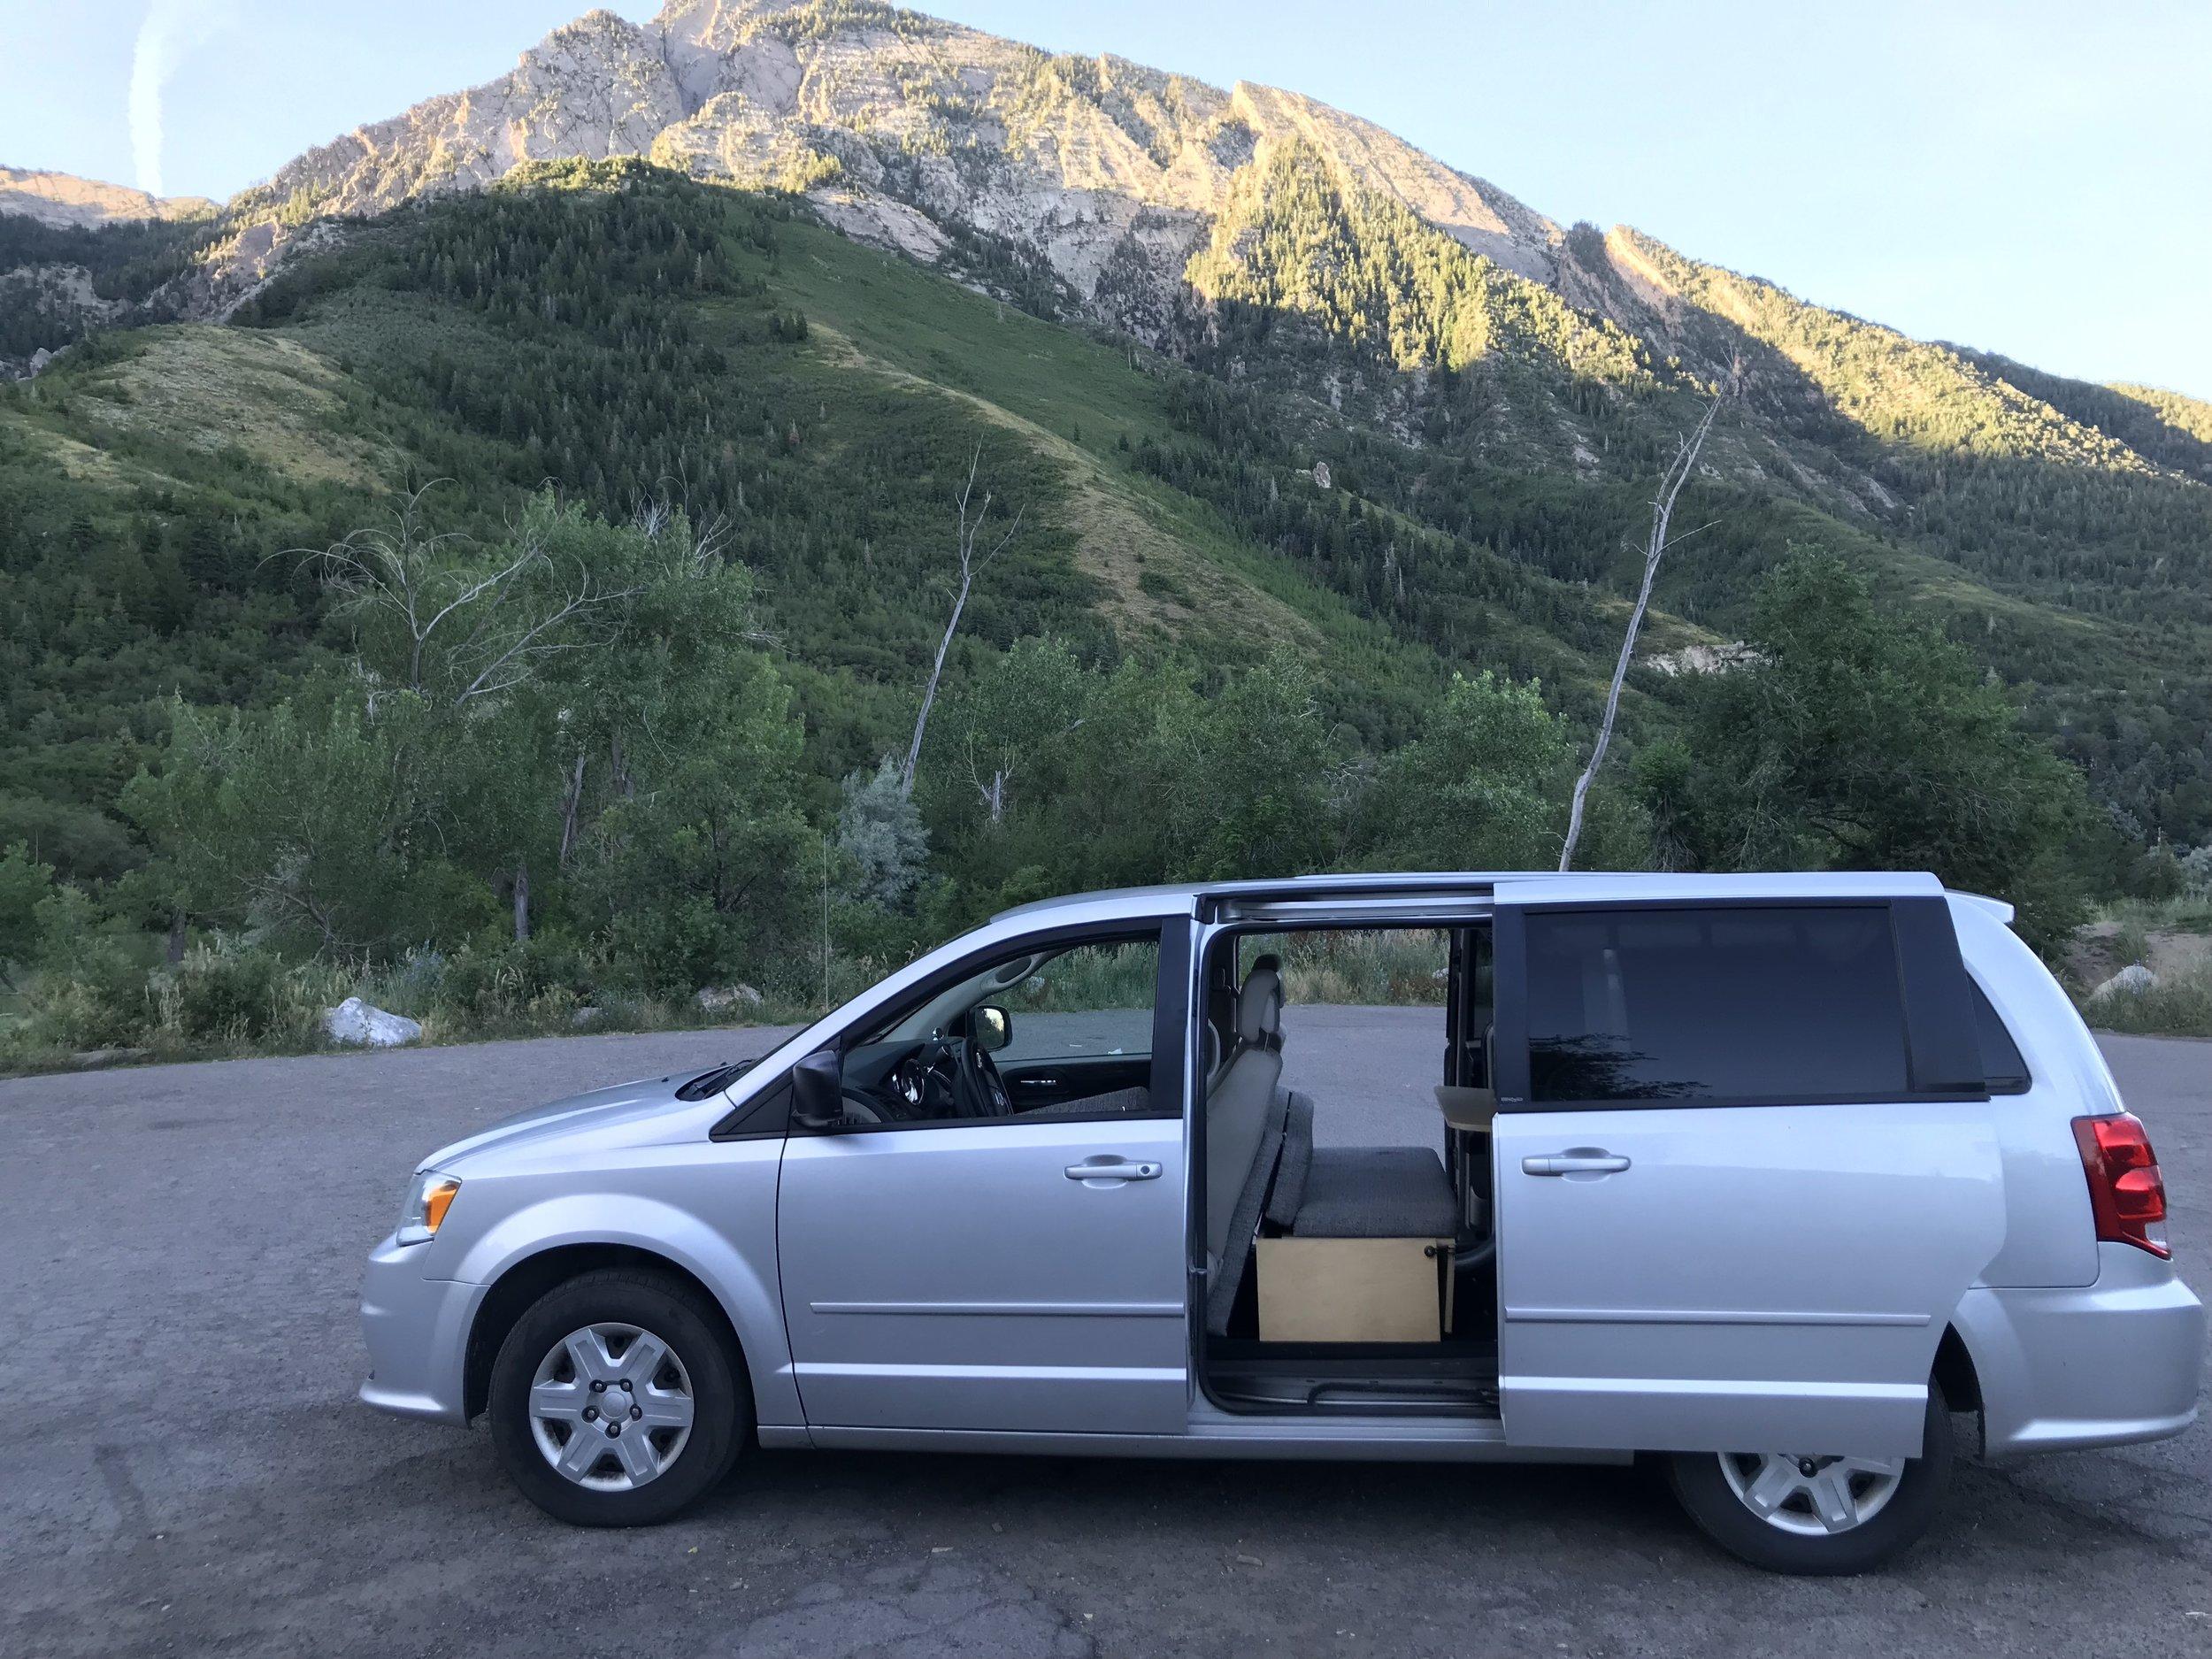 Vanny DeVito - OG Campervan$11,500Mileage: 130,426Located in Salt Lake City, Utah